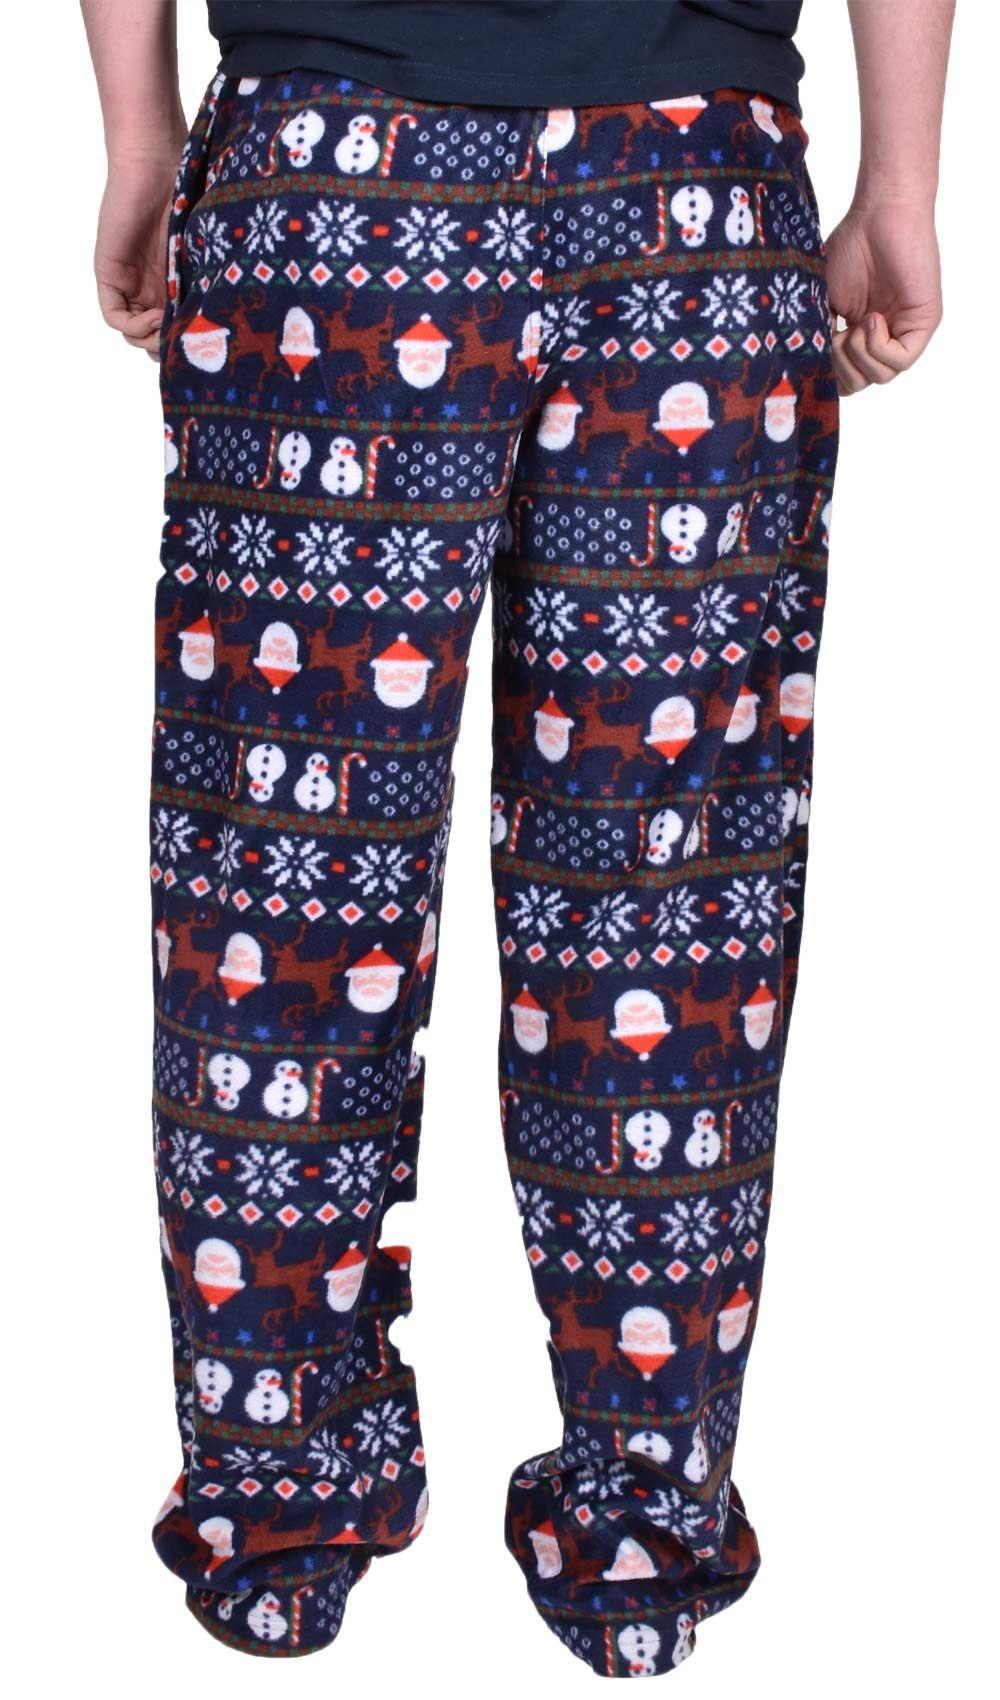 Mens-Women-Plain-Fleece-Joggers-Bottoms-Jogging-Pant-Gym-Fitness-Sports-Trousers thumbnail 29